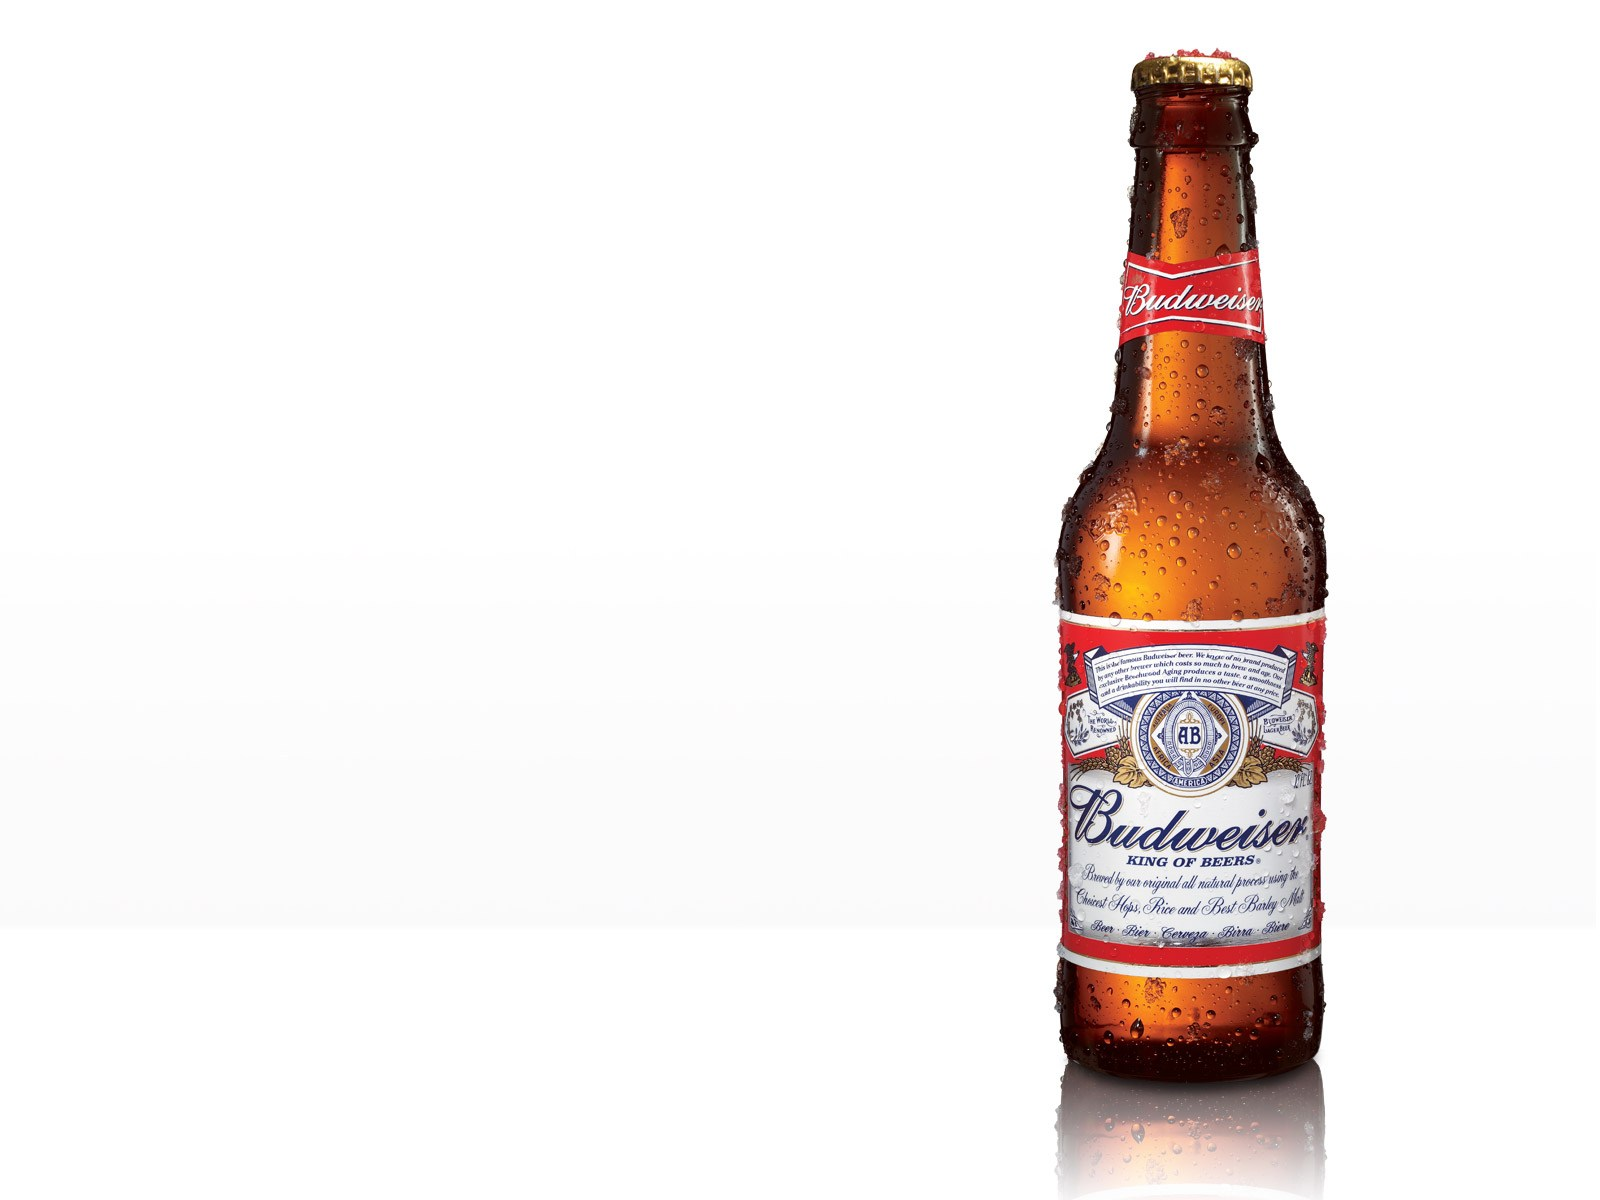 Pictures Blog: Budweiser Light Bottle